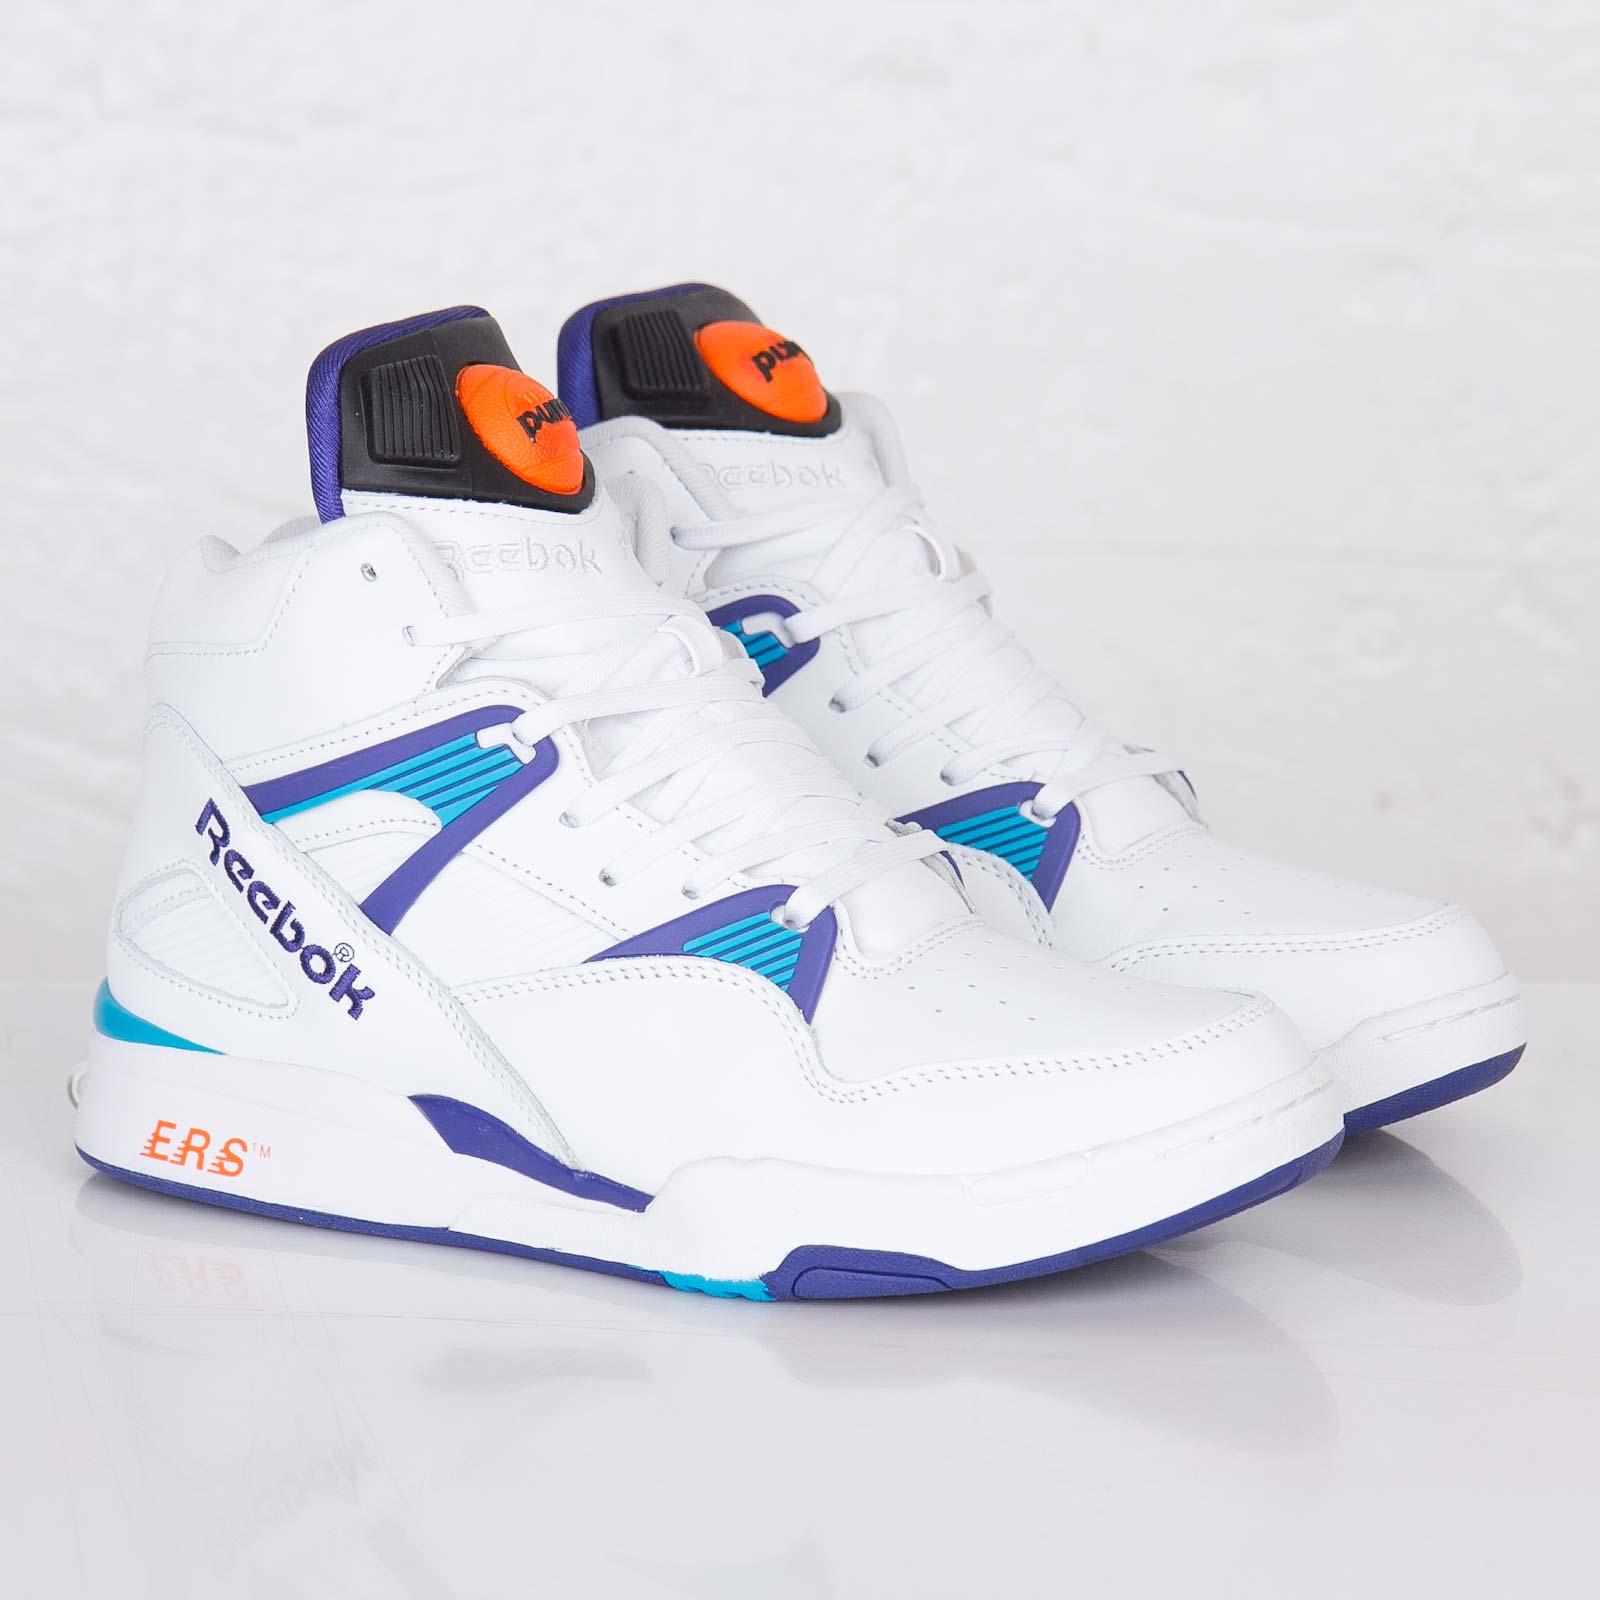 f367ae8c7c5d Reebok Pump Omni Zone Retro - V60503 - Sneakersnstuff